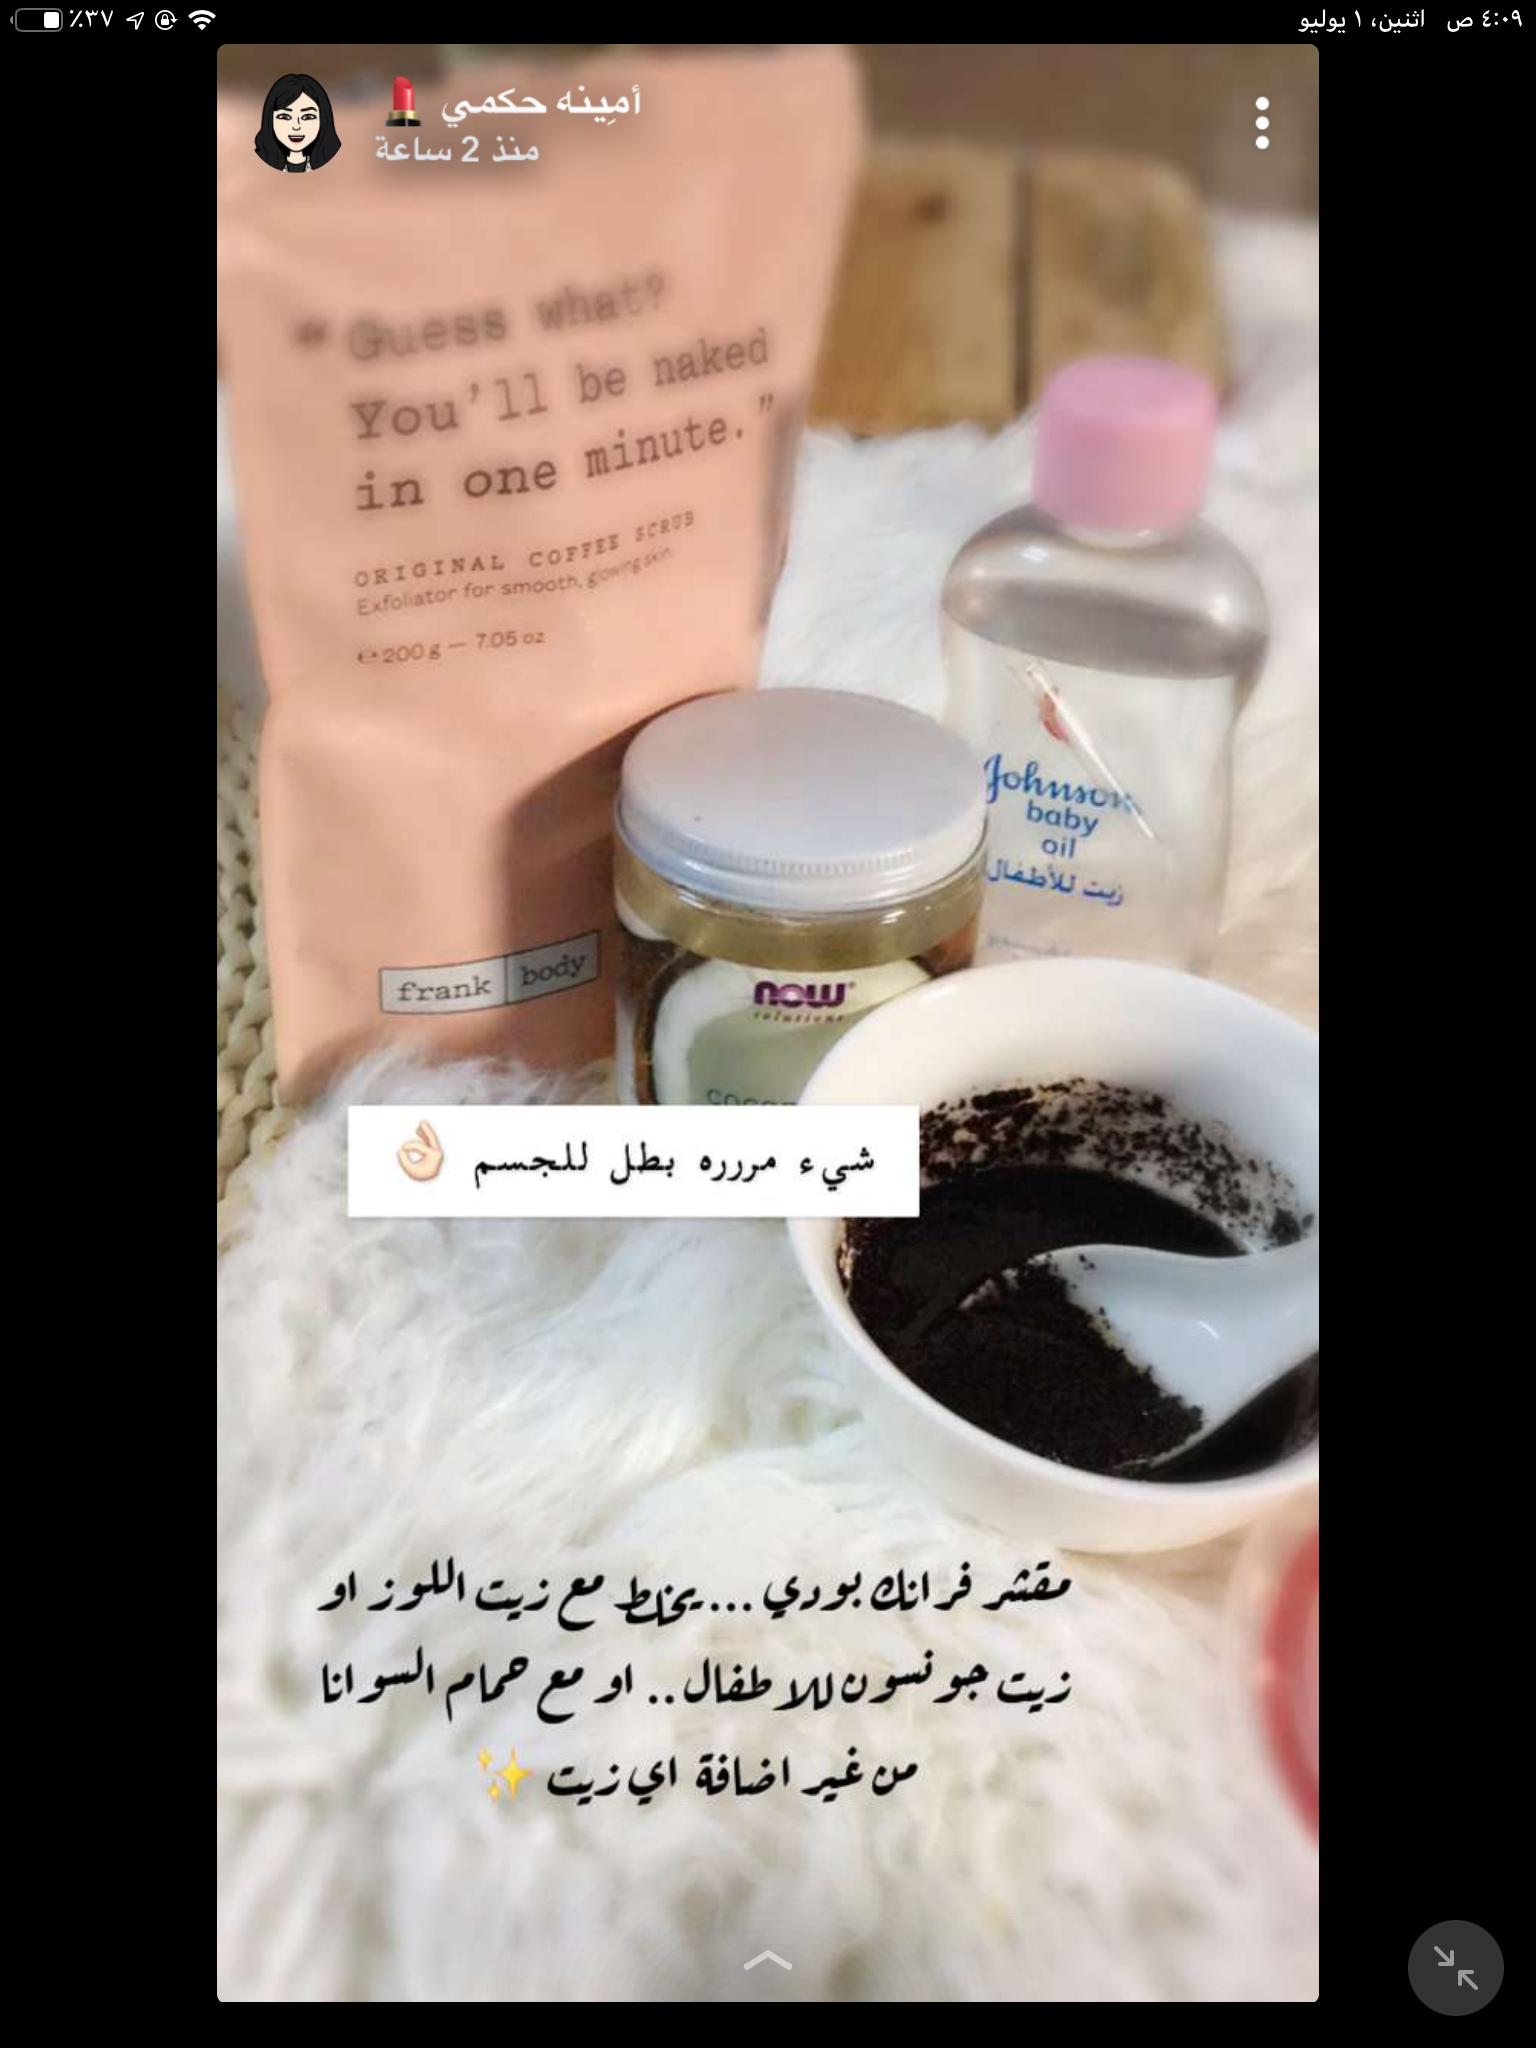 Homedecor Bts Bts خلطات تجارب عنايه اهتمام بنات Body Oil Baby Oil Body